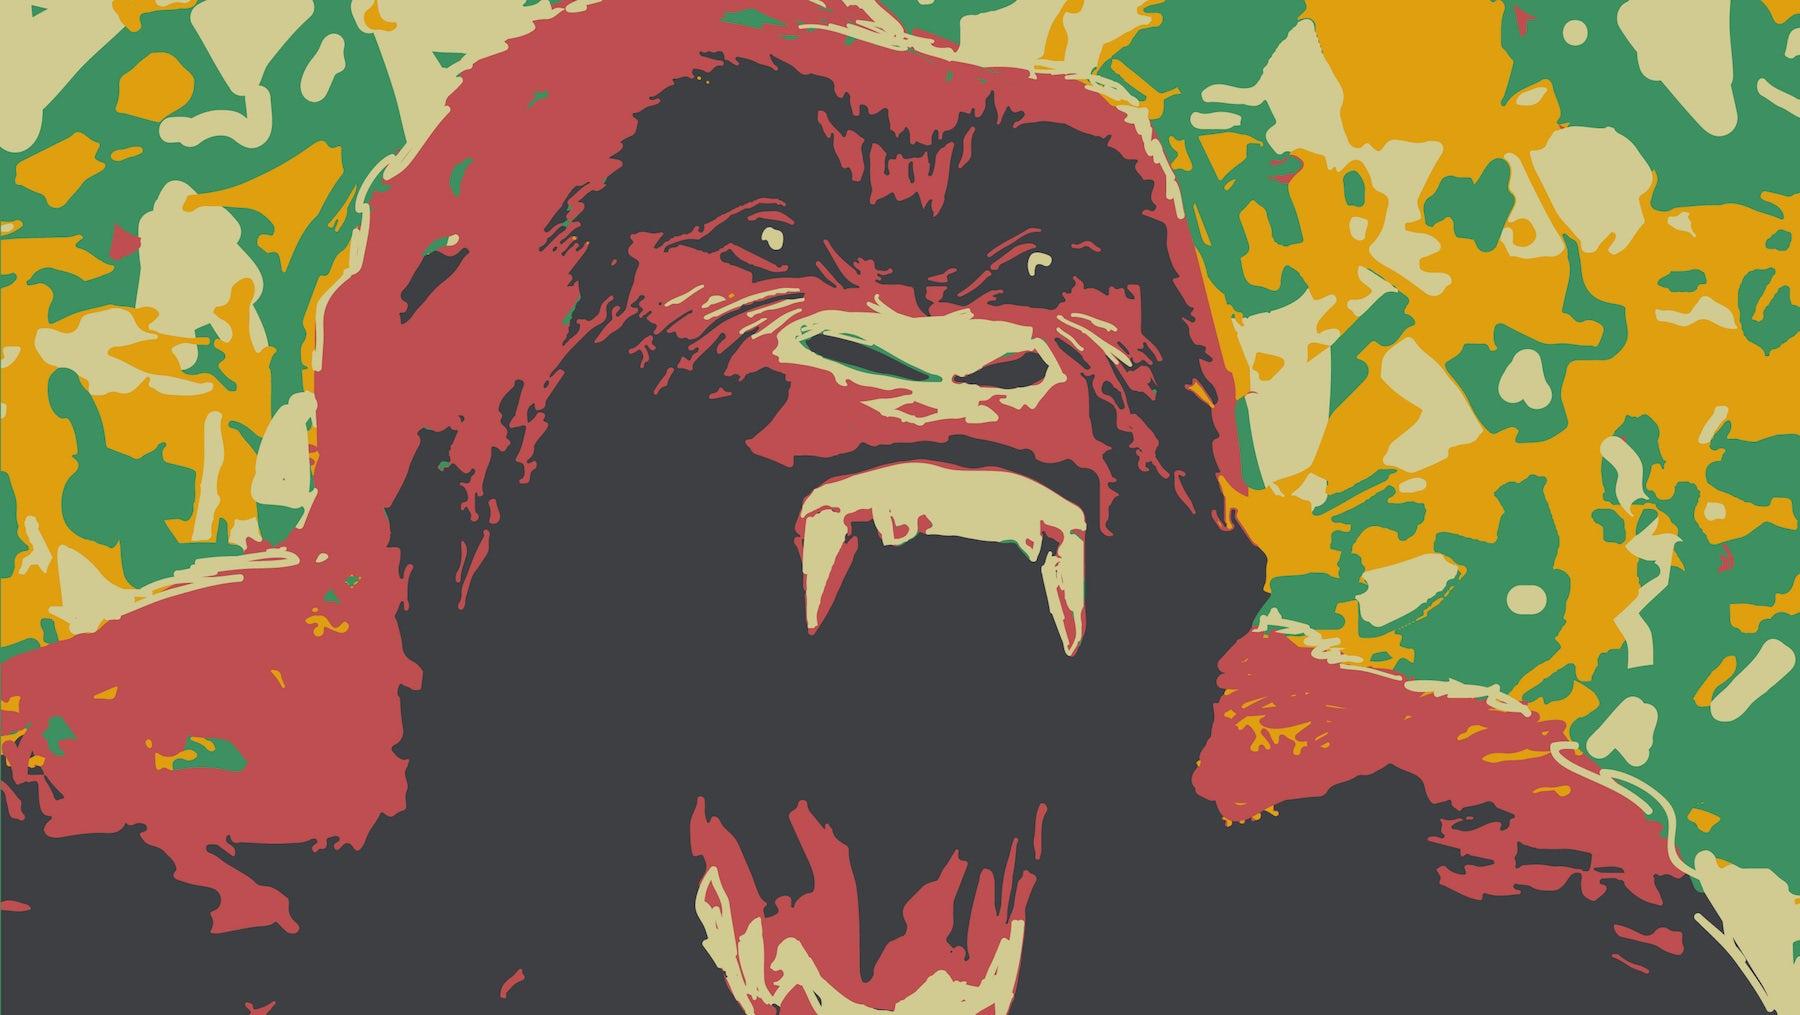 King Kong   Source: Shutterstock